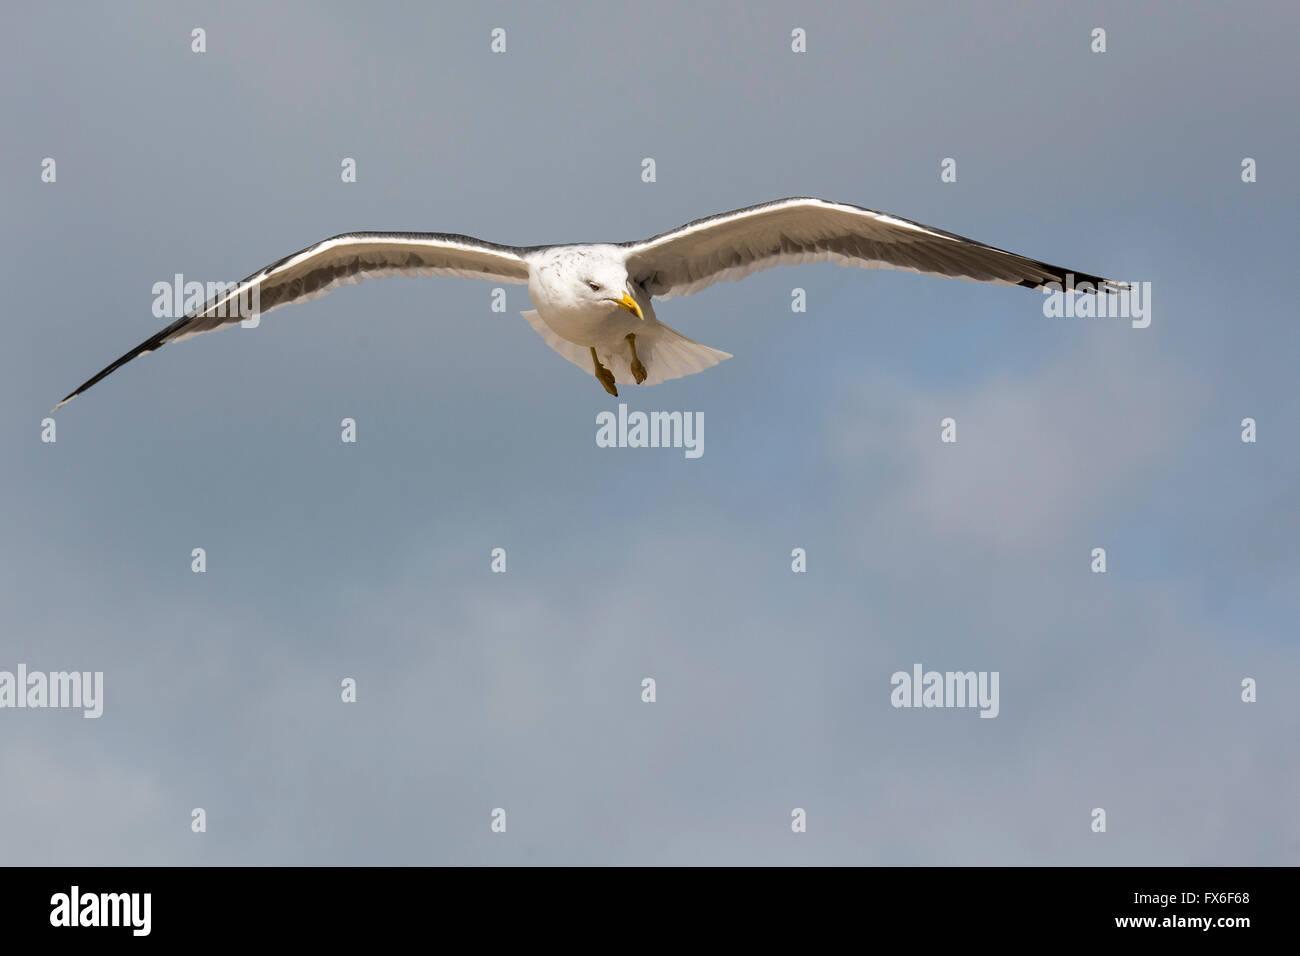 Möwe fliegen, Cádiz, Andalusien Spanien. Europa Stockbild